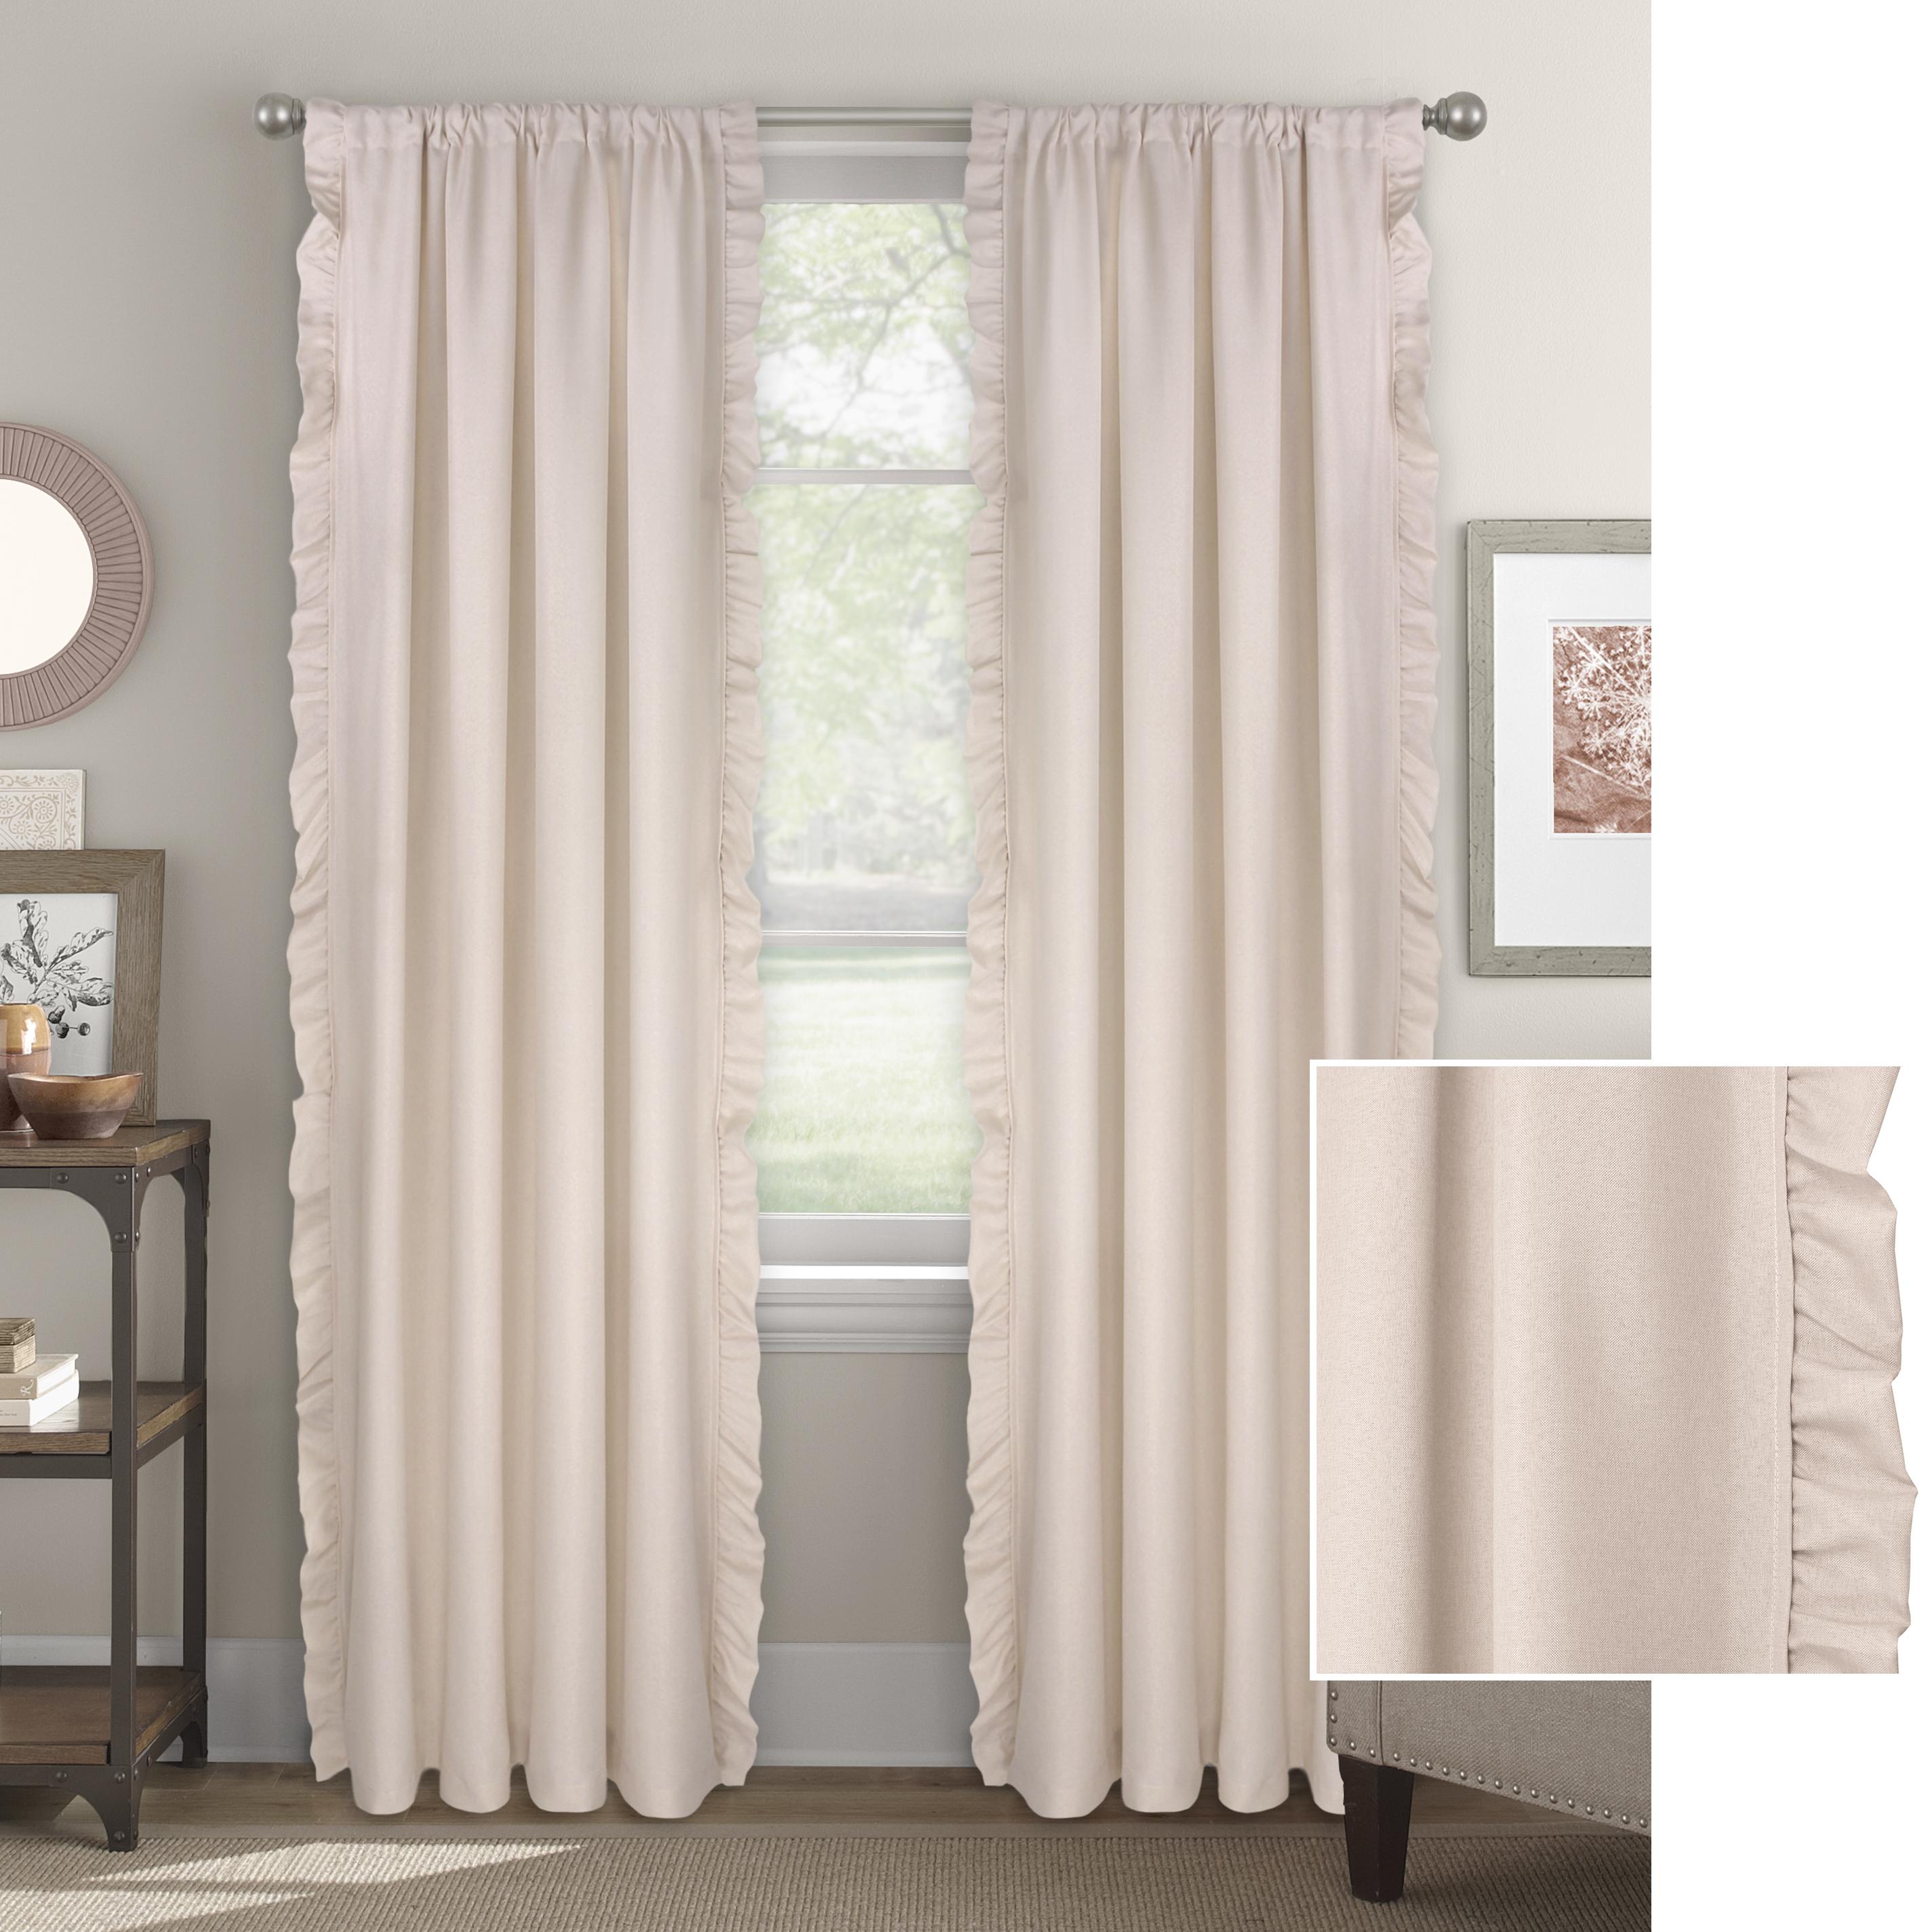 Better Homes & Gardens Vertical Ruffle Window Curtain Panel